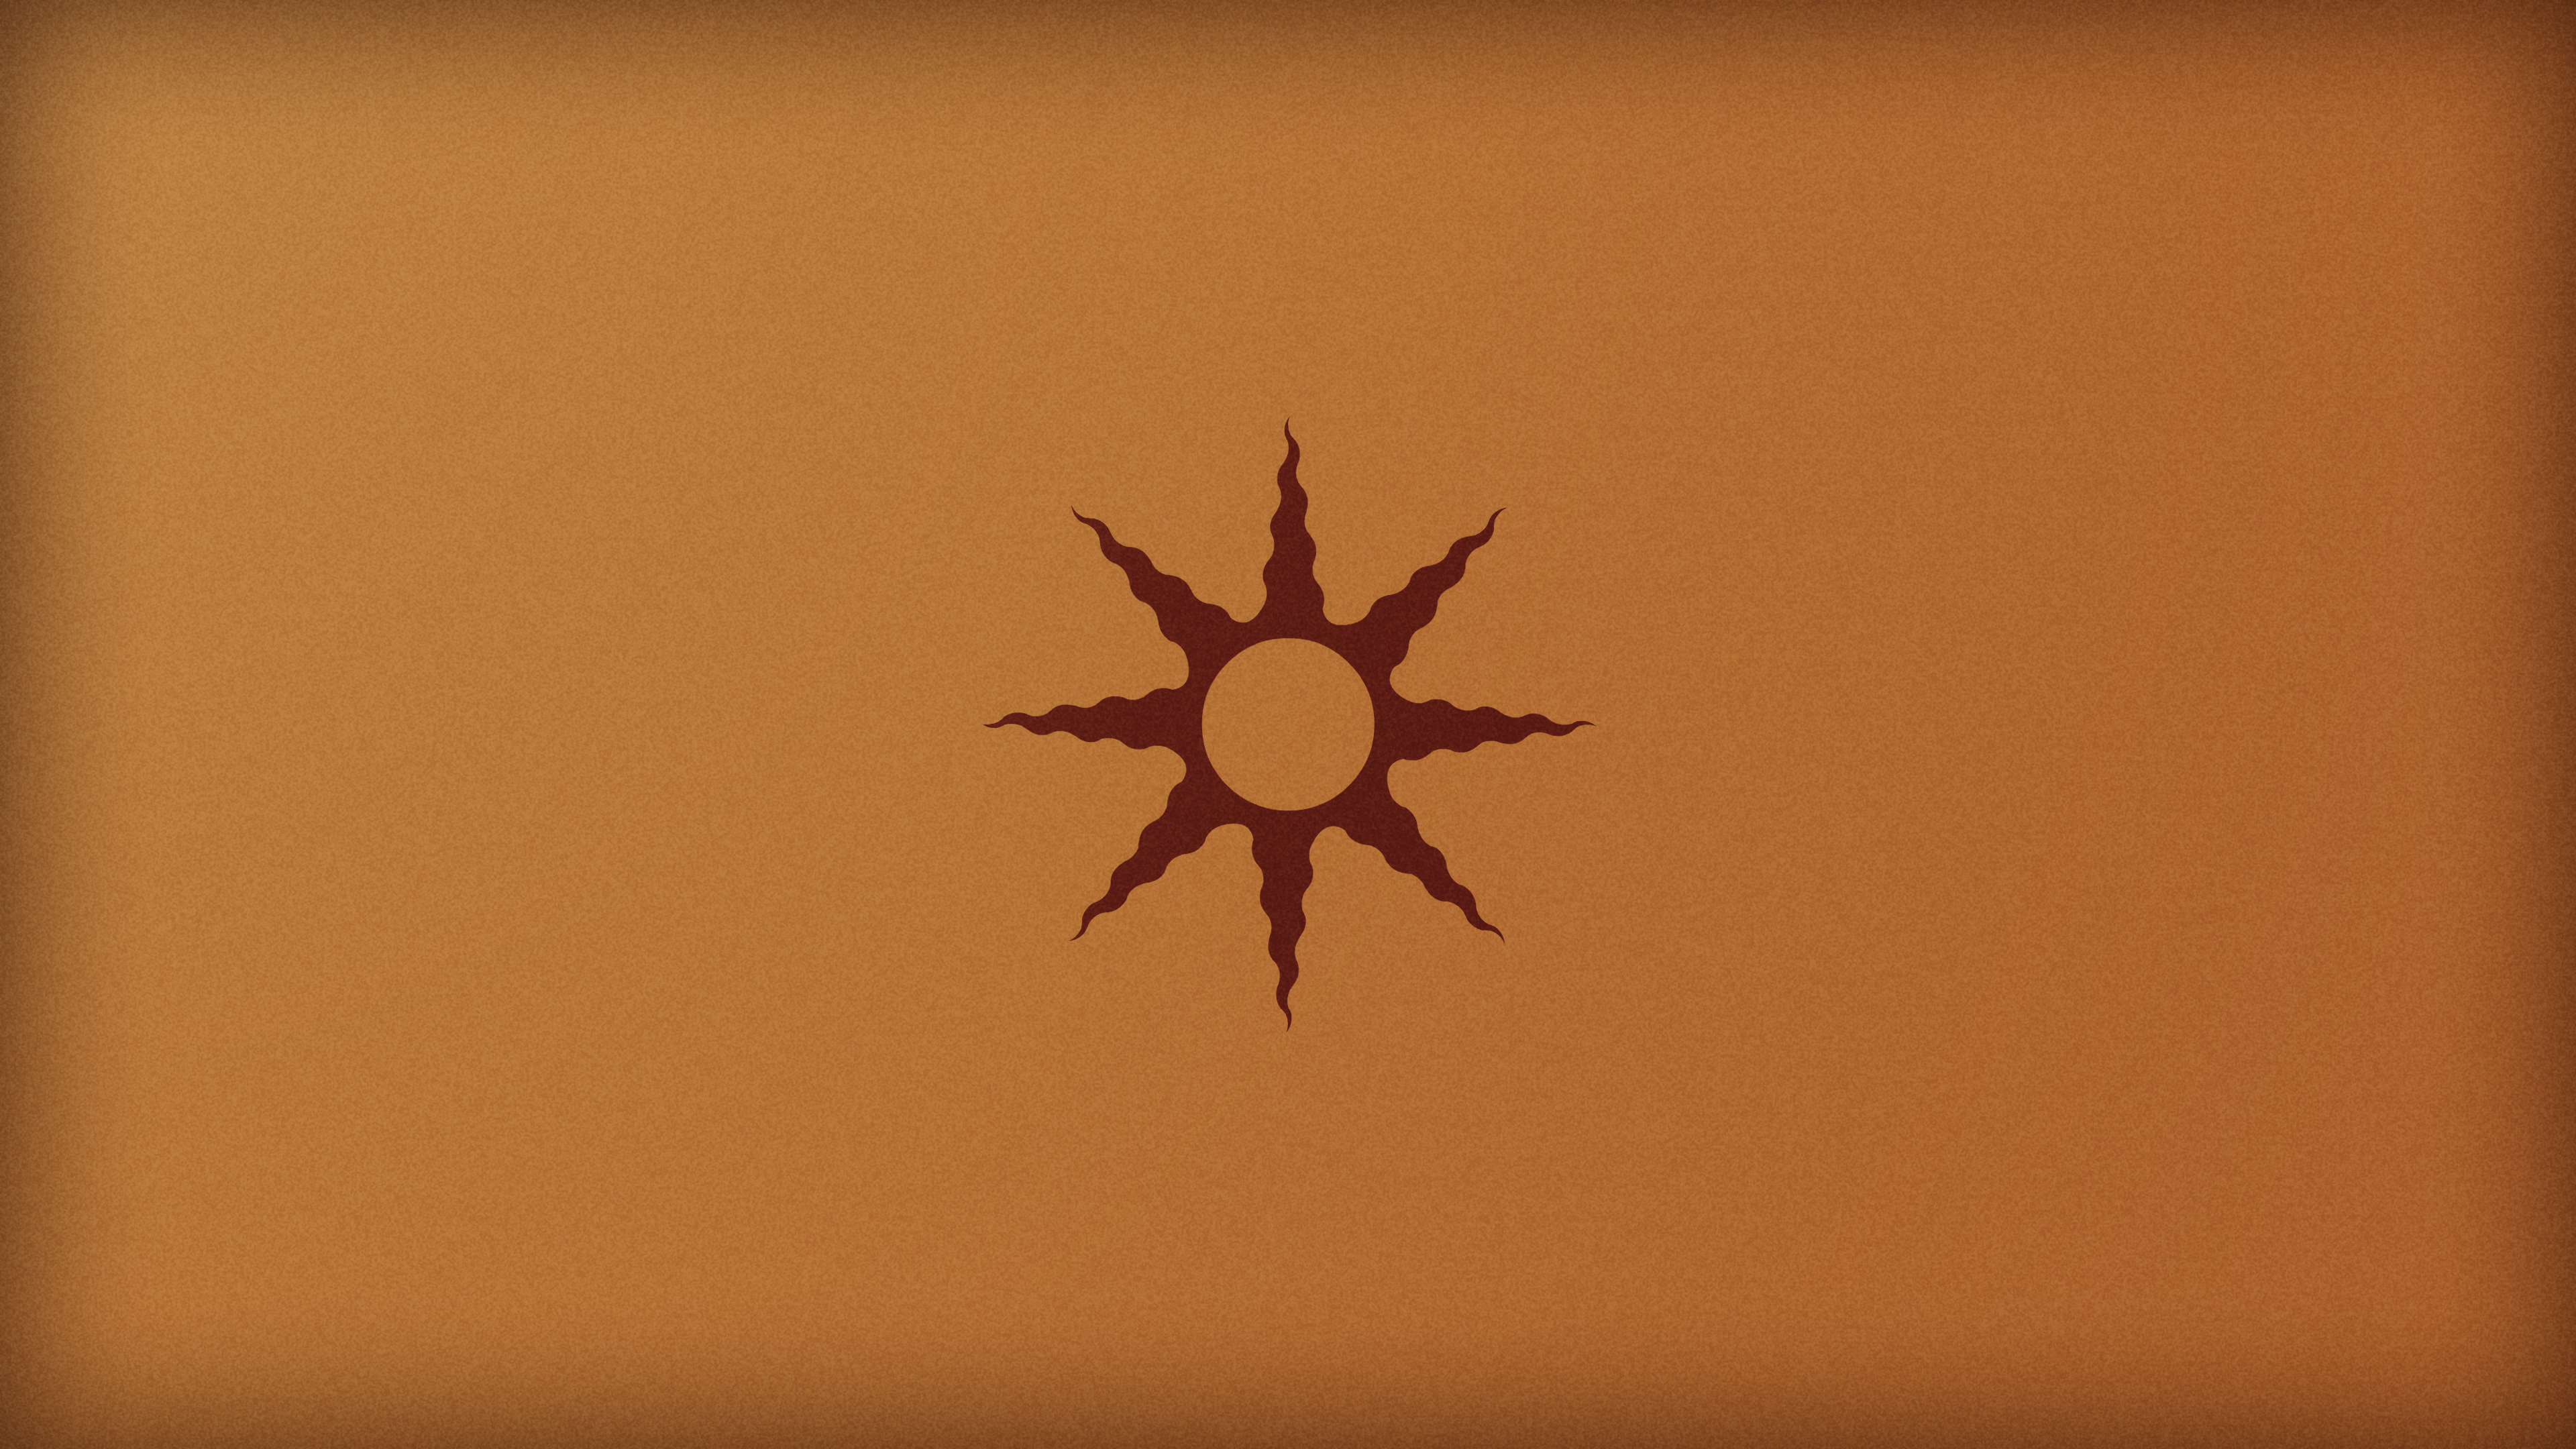 Simplistic Wallpaper Dark Souls 3840x2160 Wallpaper Teahub Io